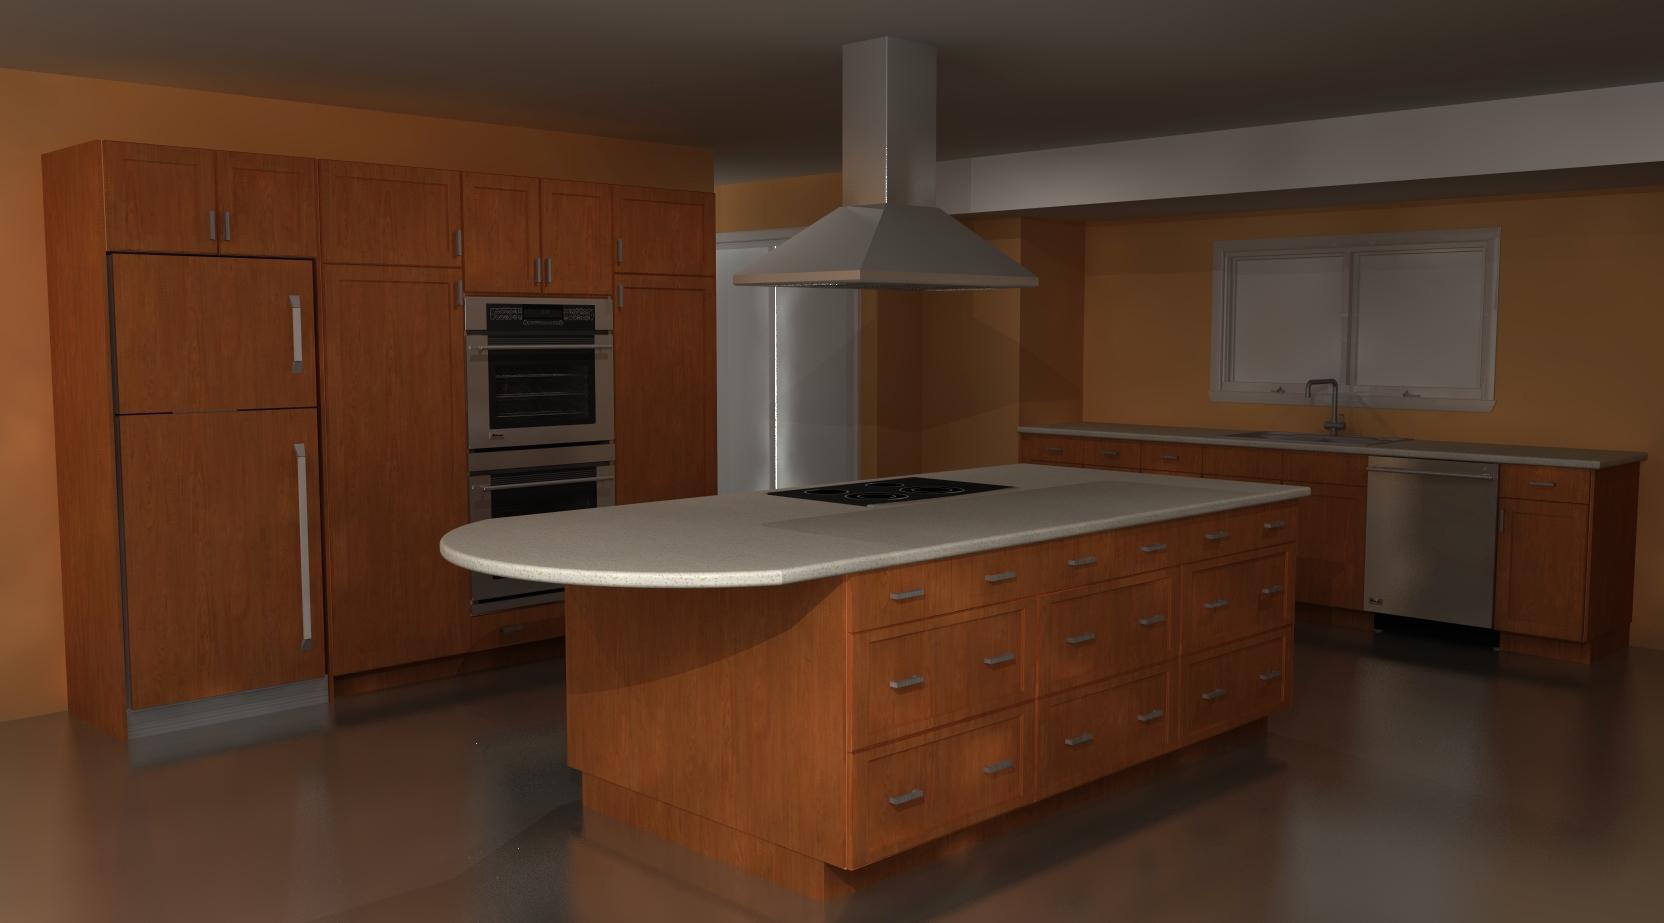 Design Ideas A Warm Contemporary Ikea Kitchen